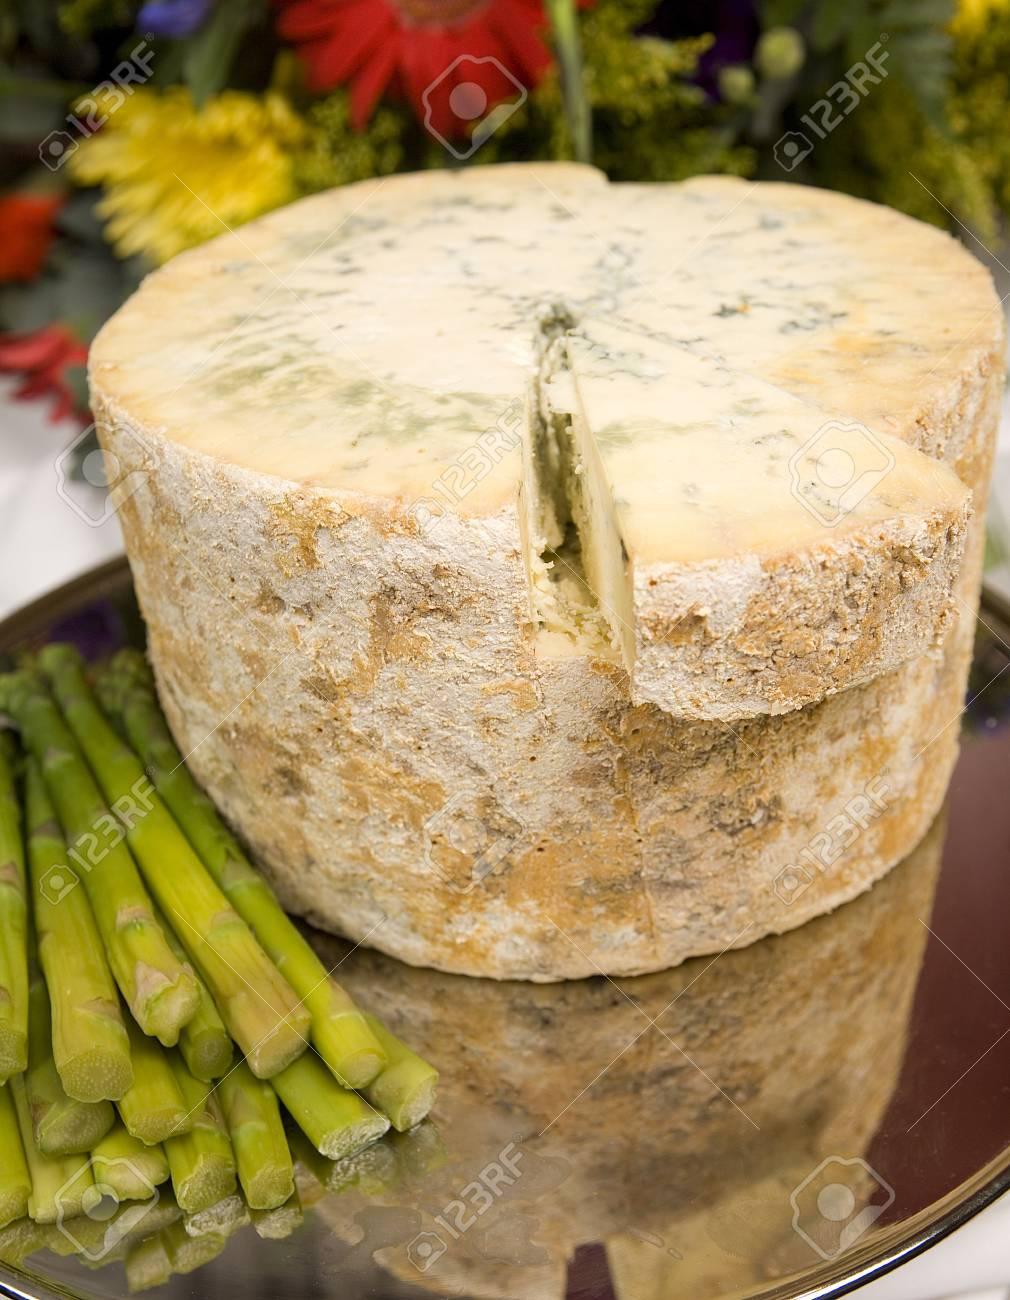 A whole Stilton cheese with asparagus spears. Stock Photo - 6080987